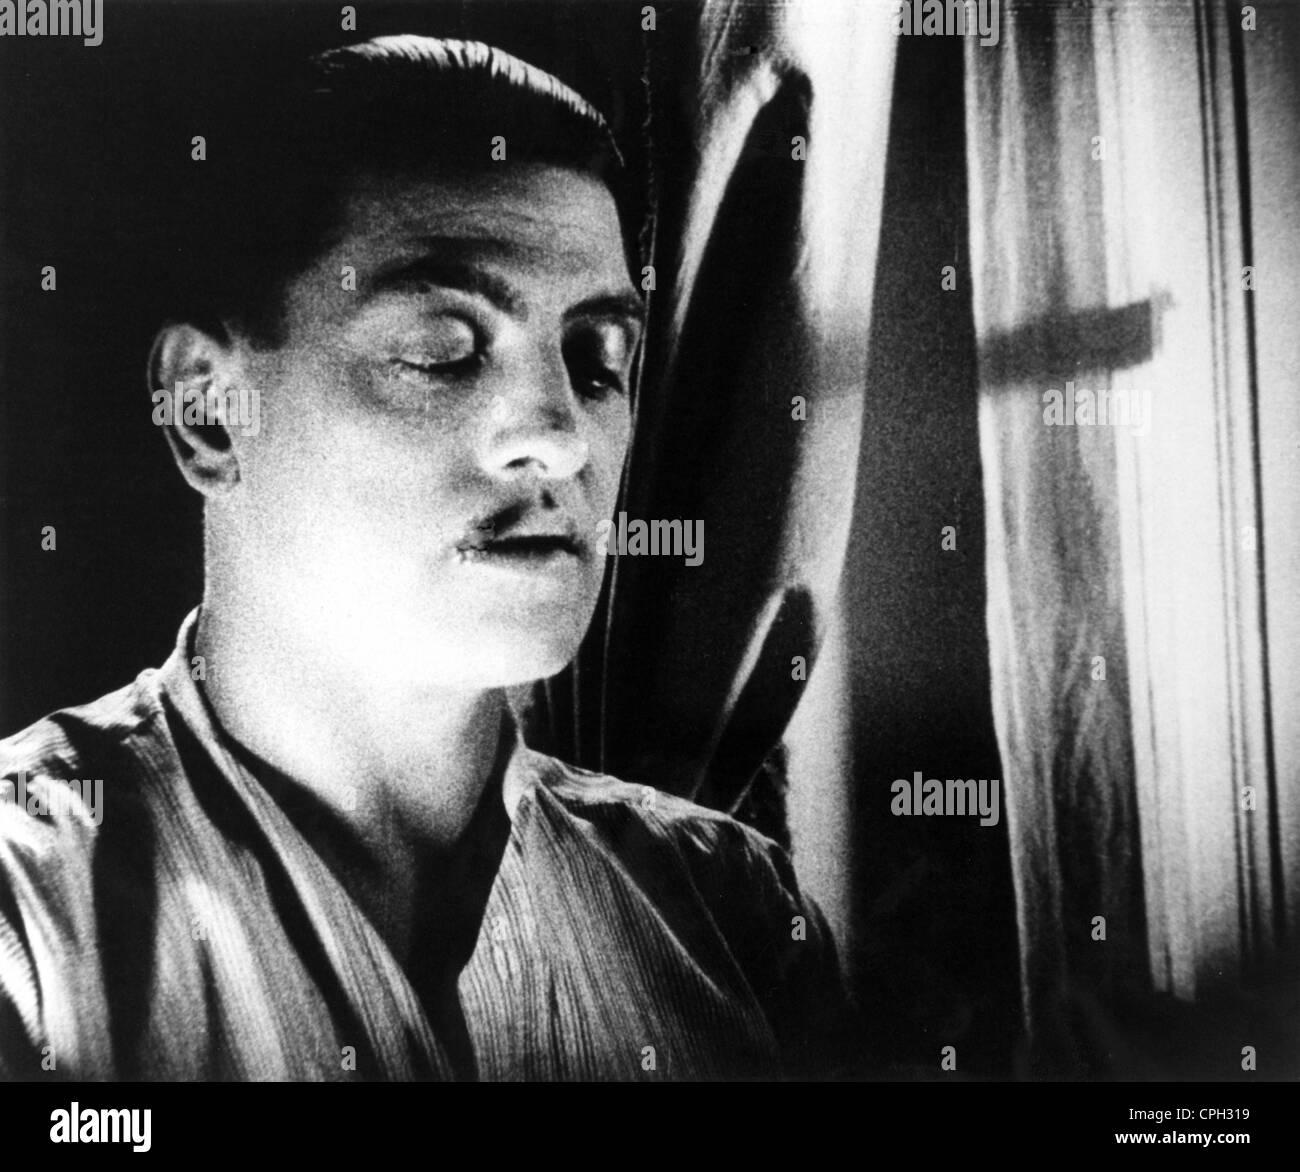 UN CHIEN ANDALOU (1929) PIERRE BATCHEFF LUIS BUNUEL (DIR) 008 MOVIESTORE COLLECTION LTD - Stock Image